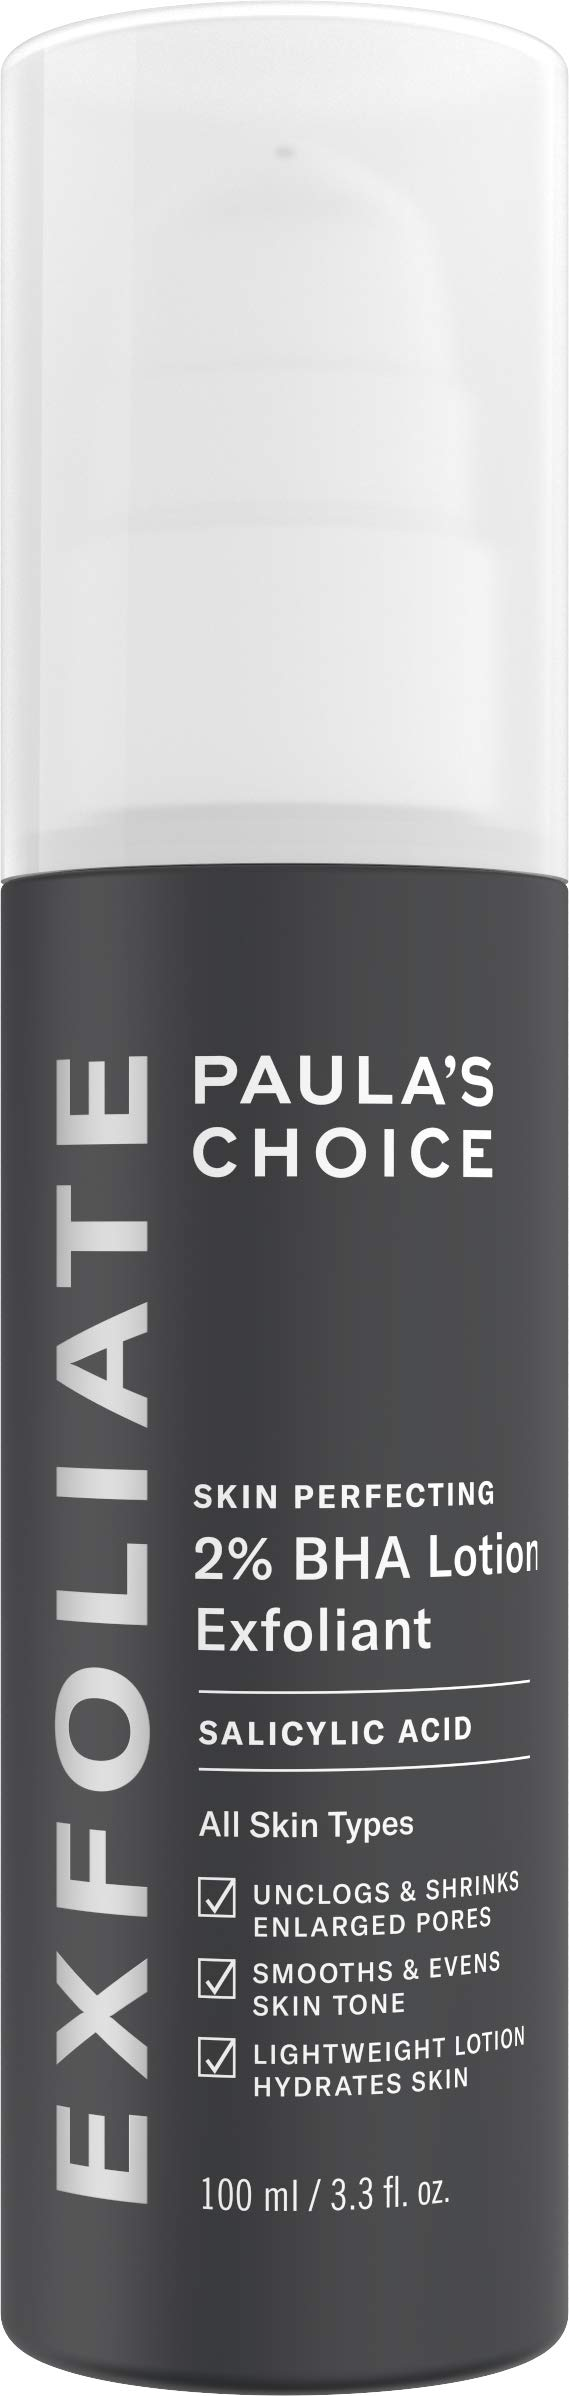 Paula's Choice SKIN PERFECTING 2% BHA Lotion Salicylic Acid Exfoliant, 3.3 Ounce Bottle Facial Exfoliator for Blackheads, Enlarged Pores, Wrinkles & Fine Lines by PAULA'S CHOICE